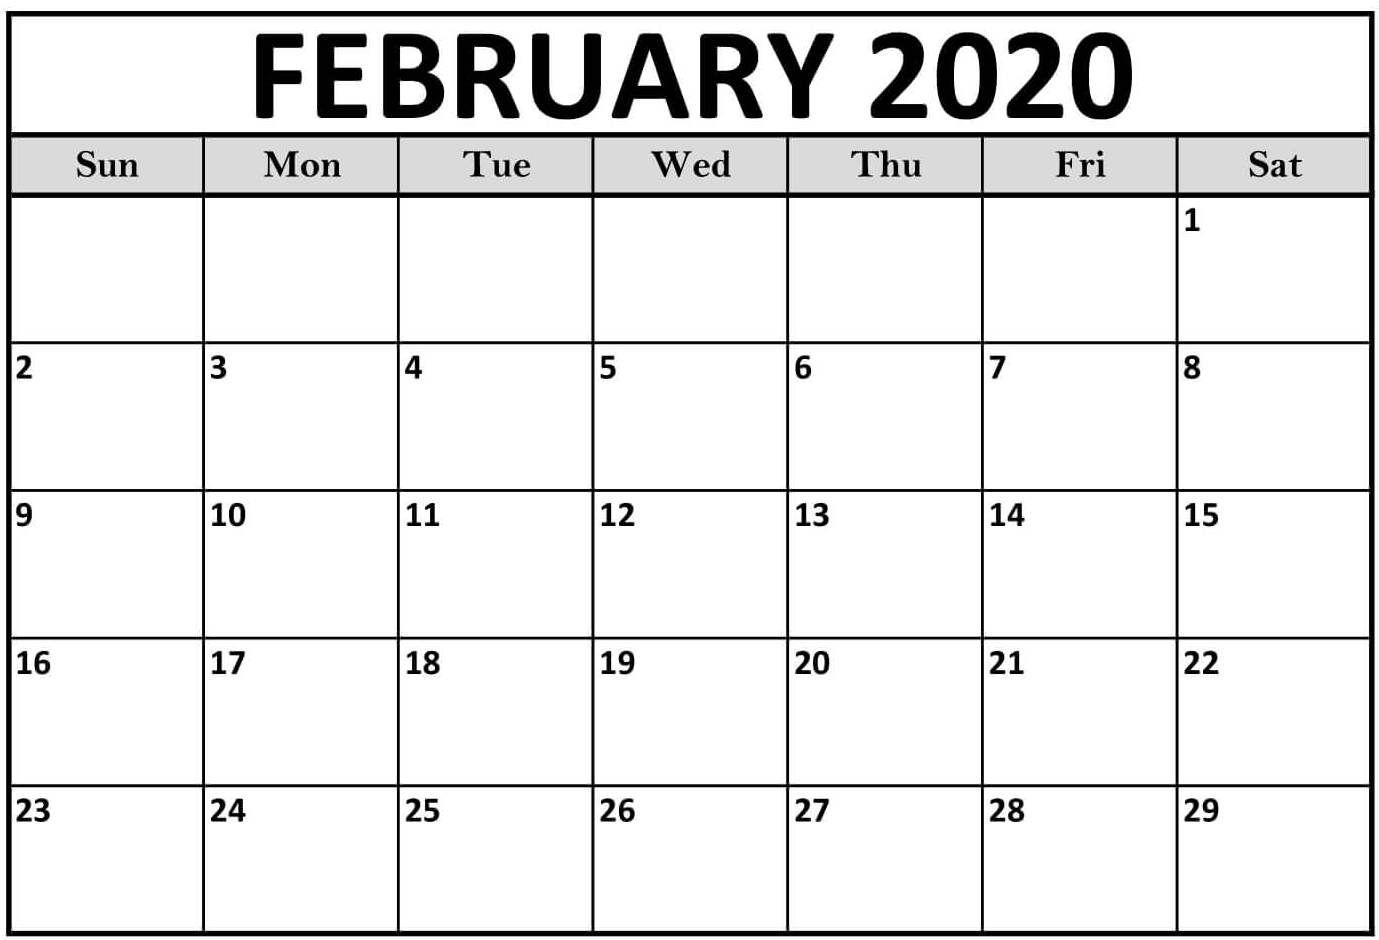 Editable Feb 2020 Calendar Pdf Word Excel Printable Template With